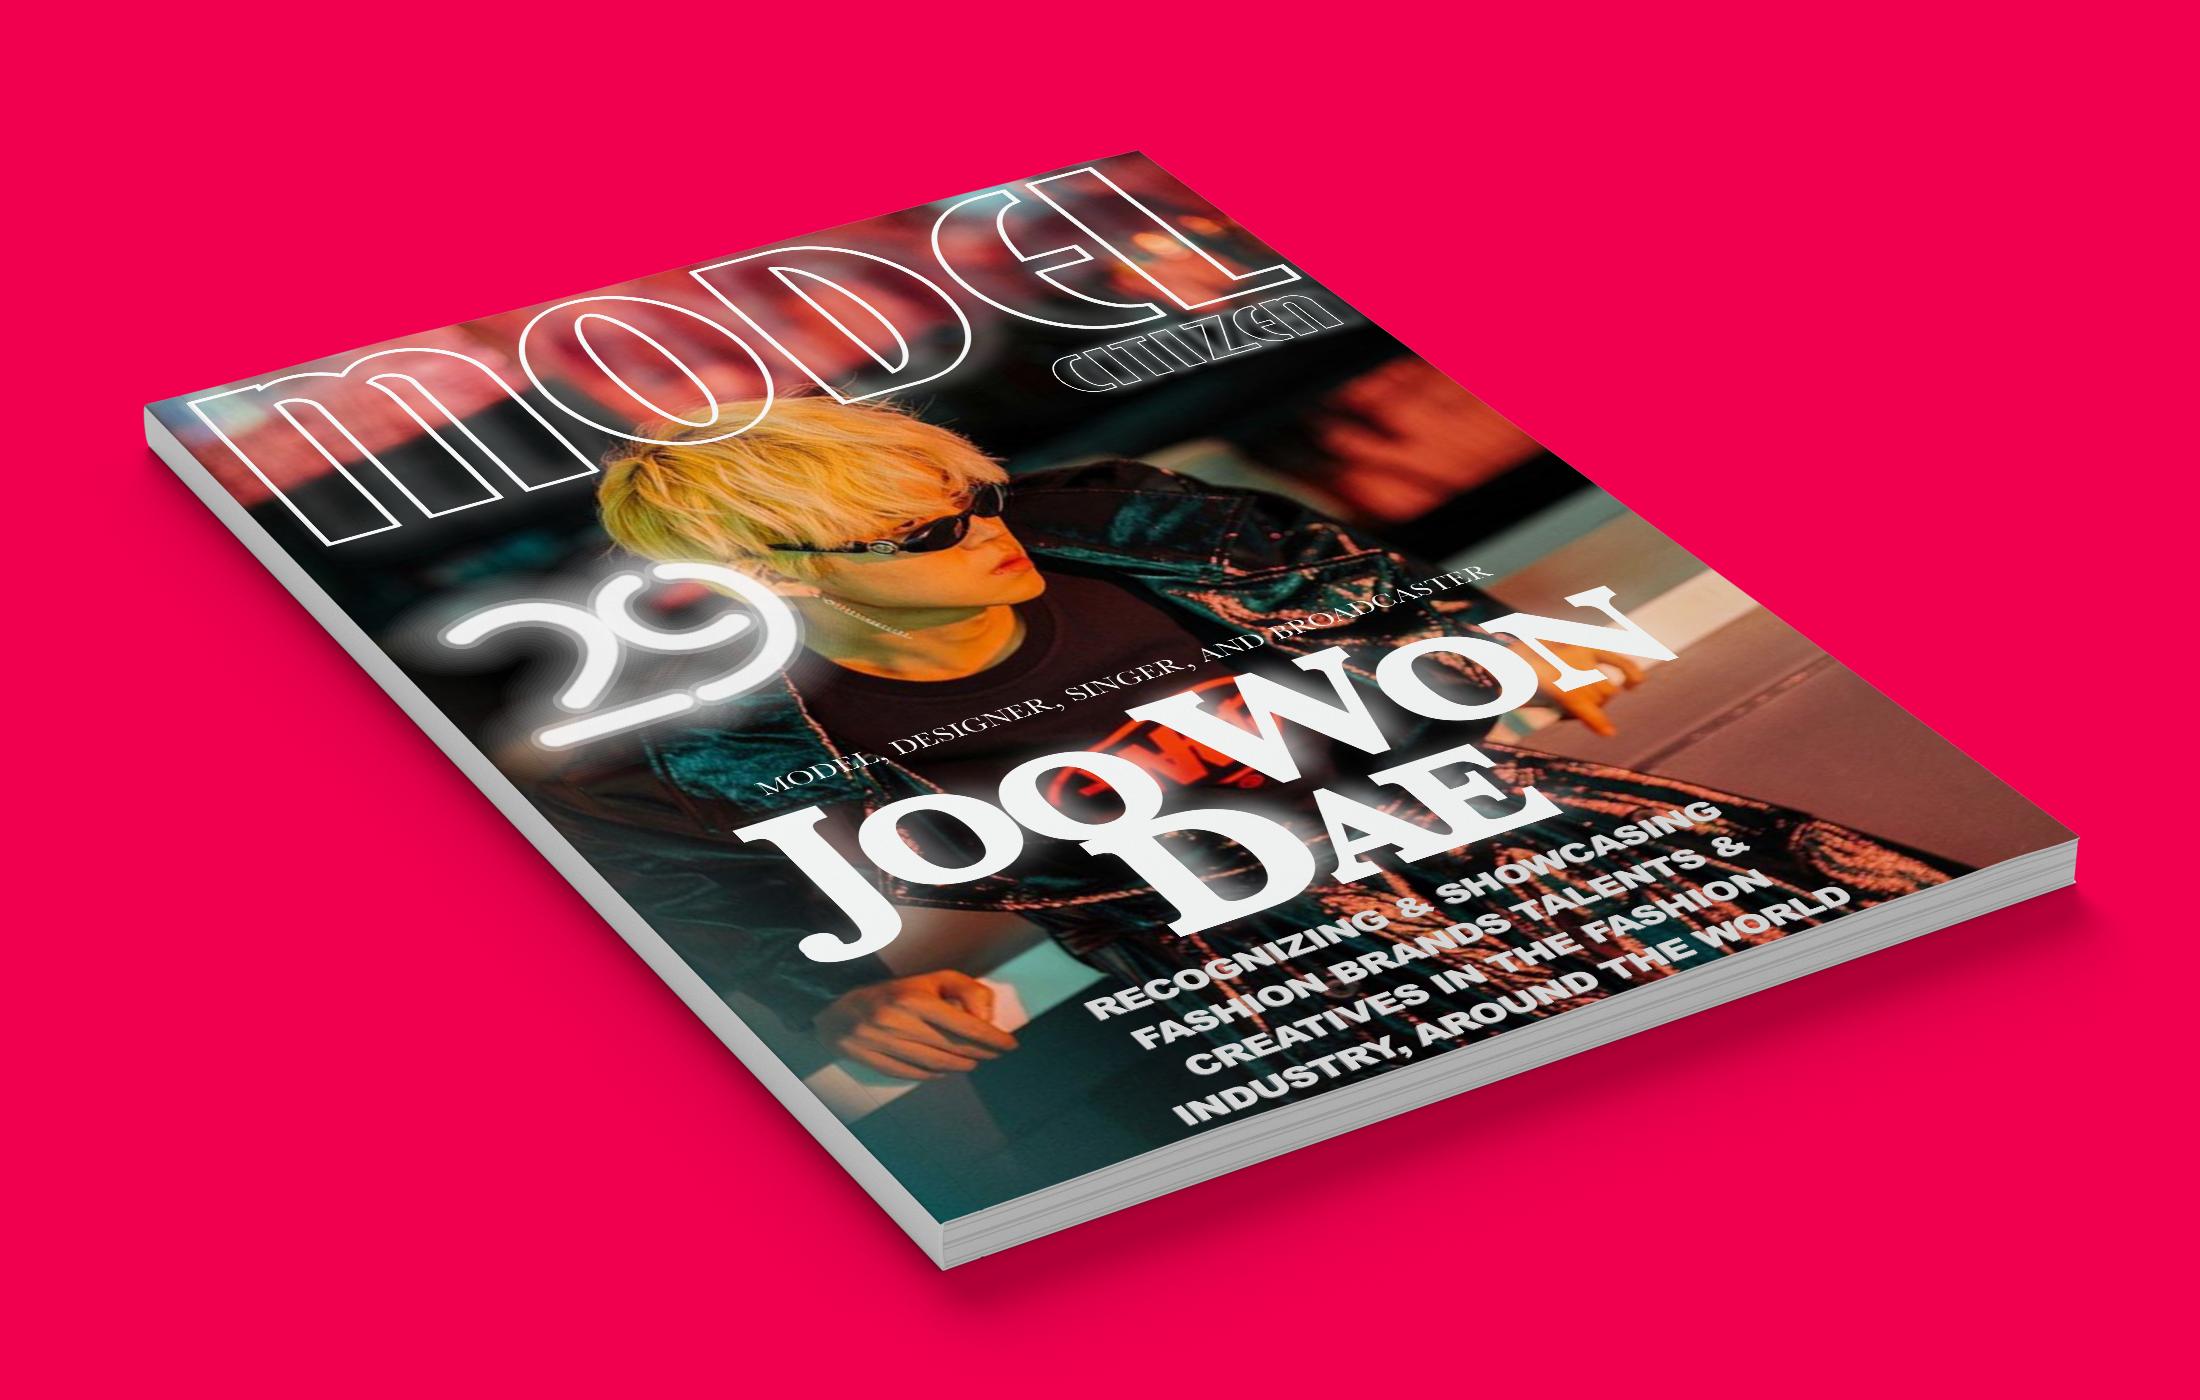 Model Citizen Magazine Issue 28, Macky Suson, Fashion Inclusion Now1 .png